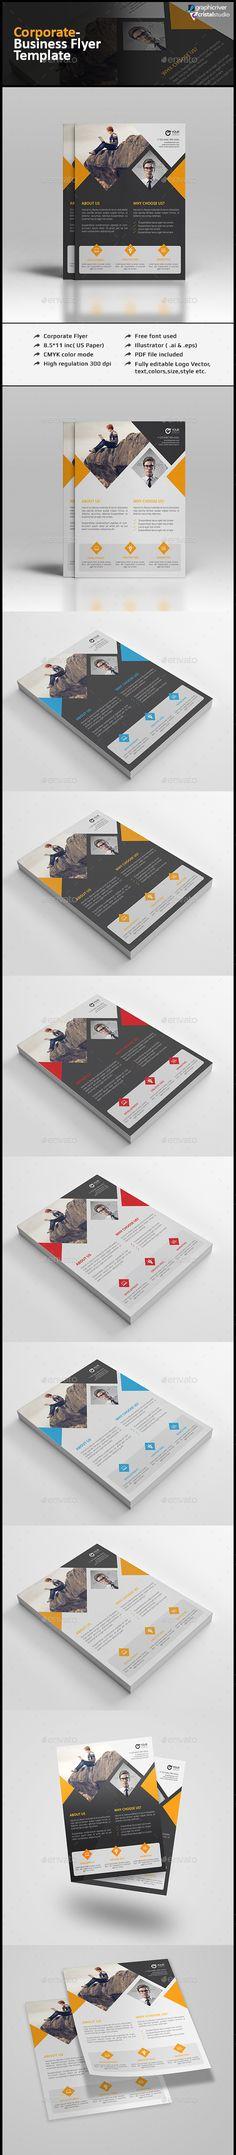 Corporate Clean Flyer Template Vector EPS, AI Illustrator #design Download: http://graphicriver.net/item/corporate-clean-flyer/13472865?ref=ksioks